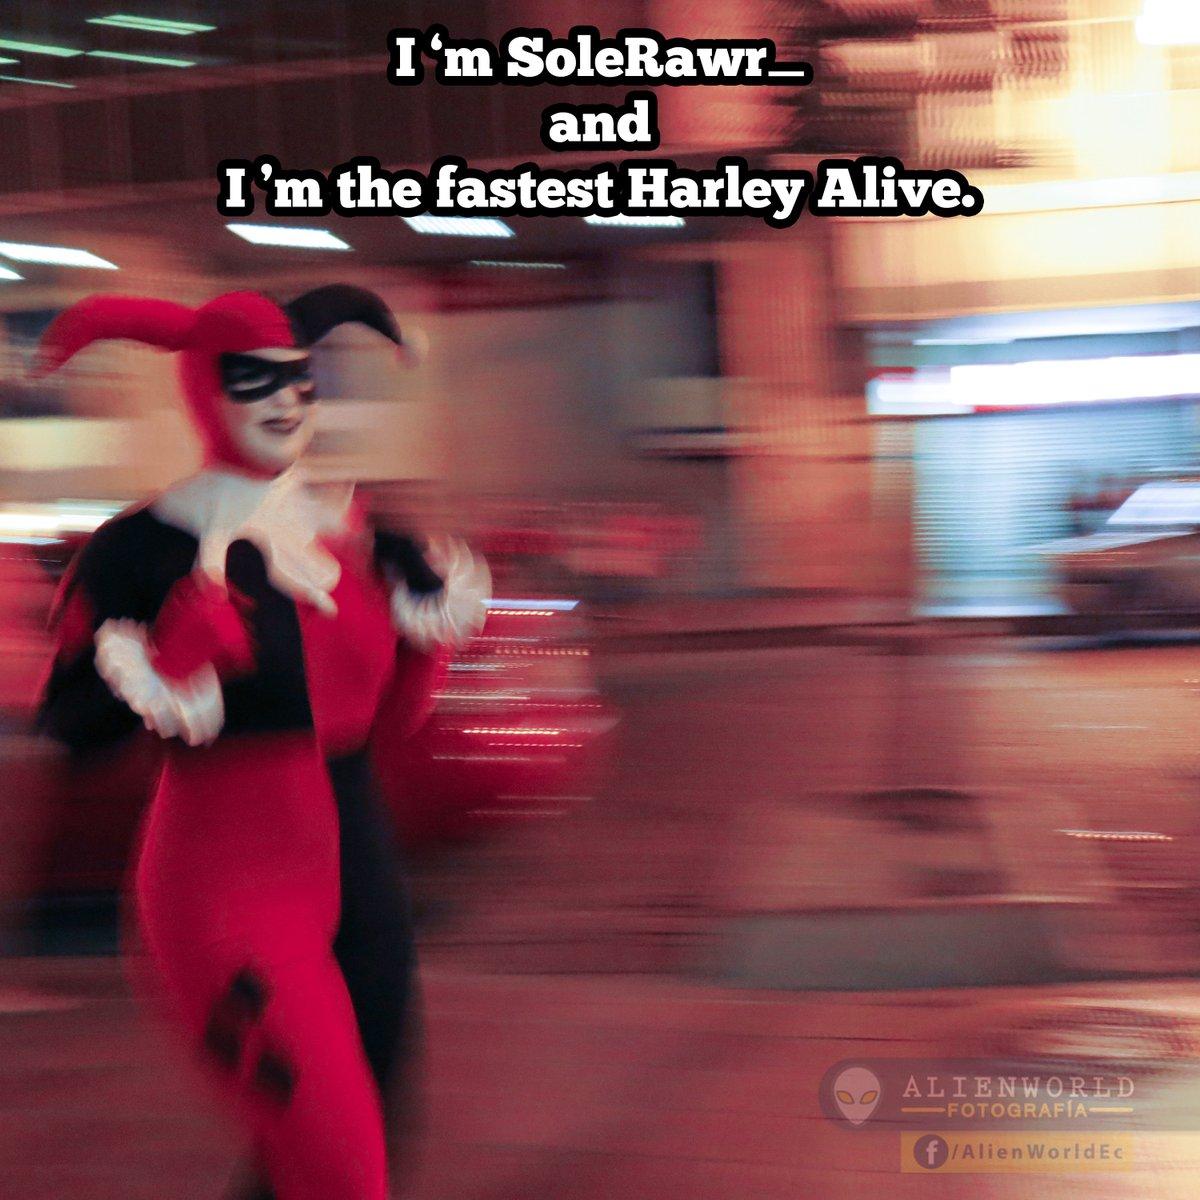 #Meme #harleyquinncosplay #cosplay #dccomics #TheFlash https://t.co/QGiT9BHgd9